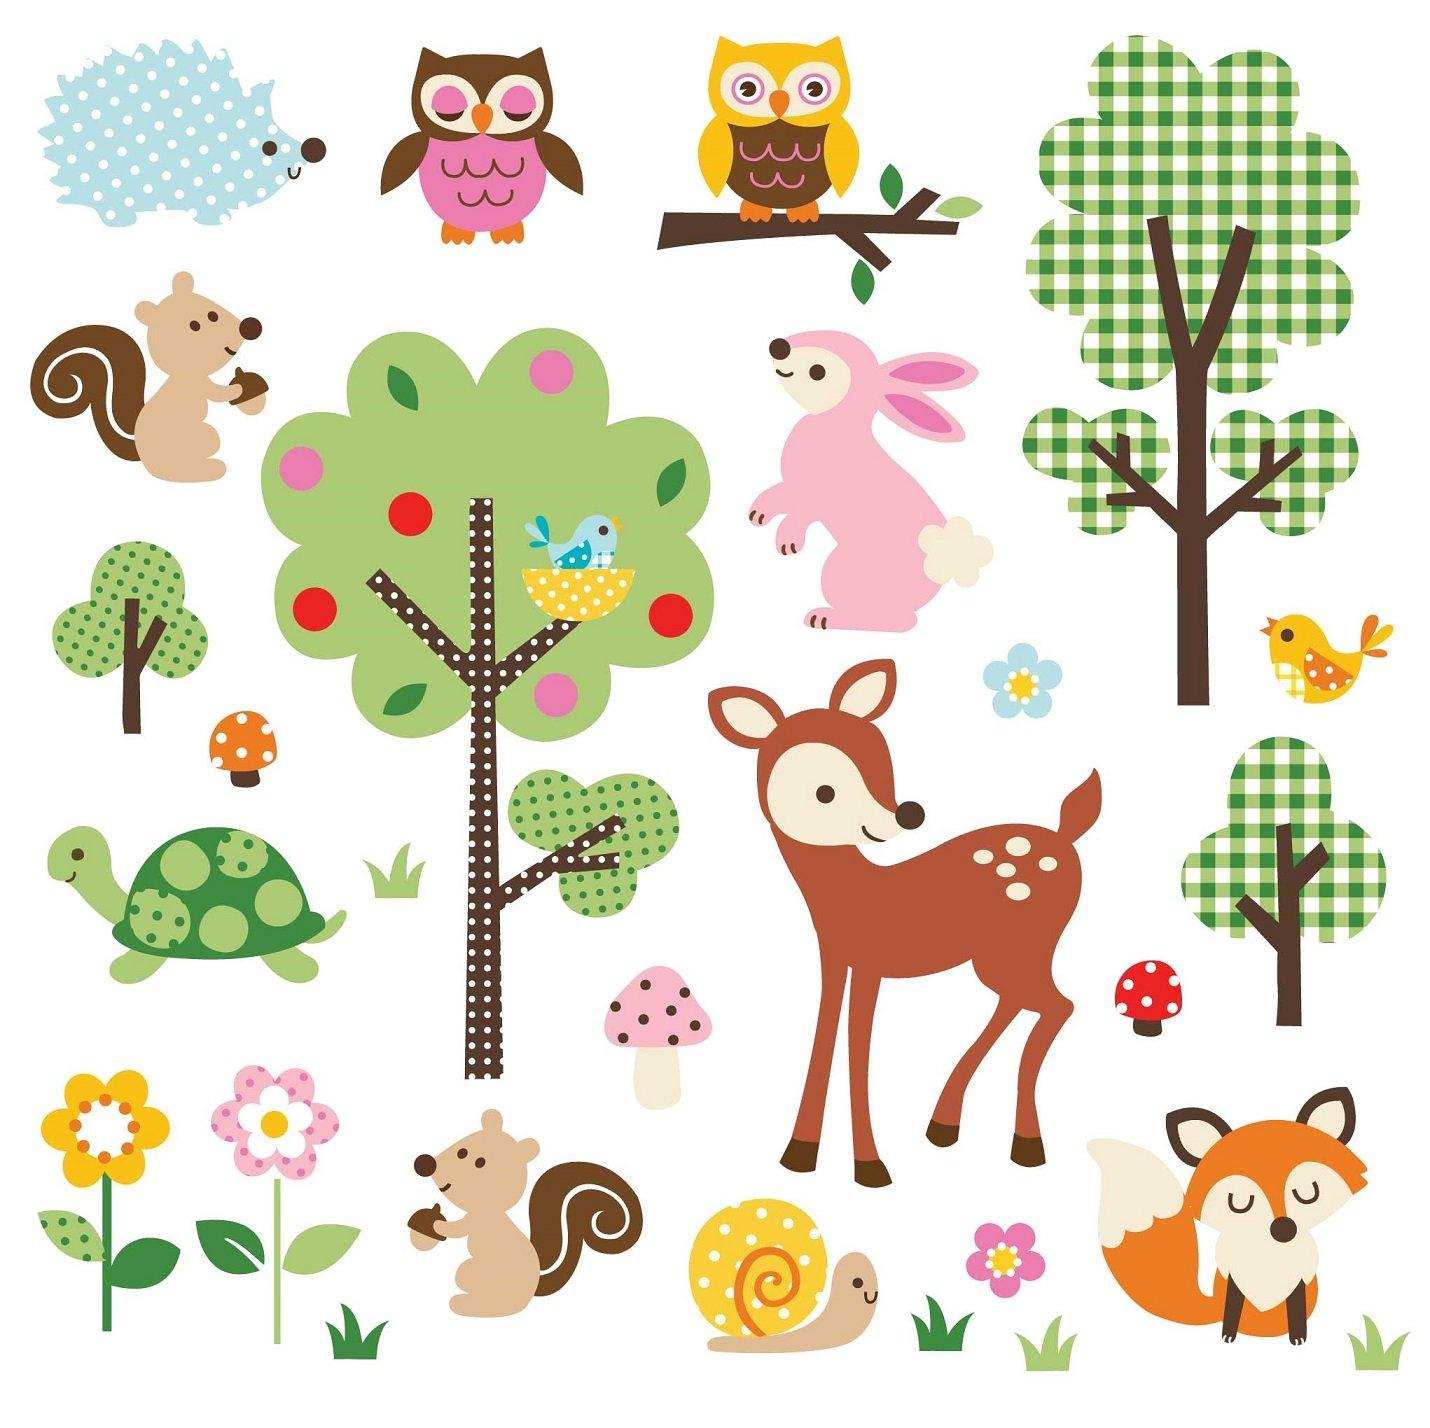 Friendly Forest Decorative Peel & Stick Wall Art Sticker Decals